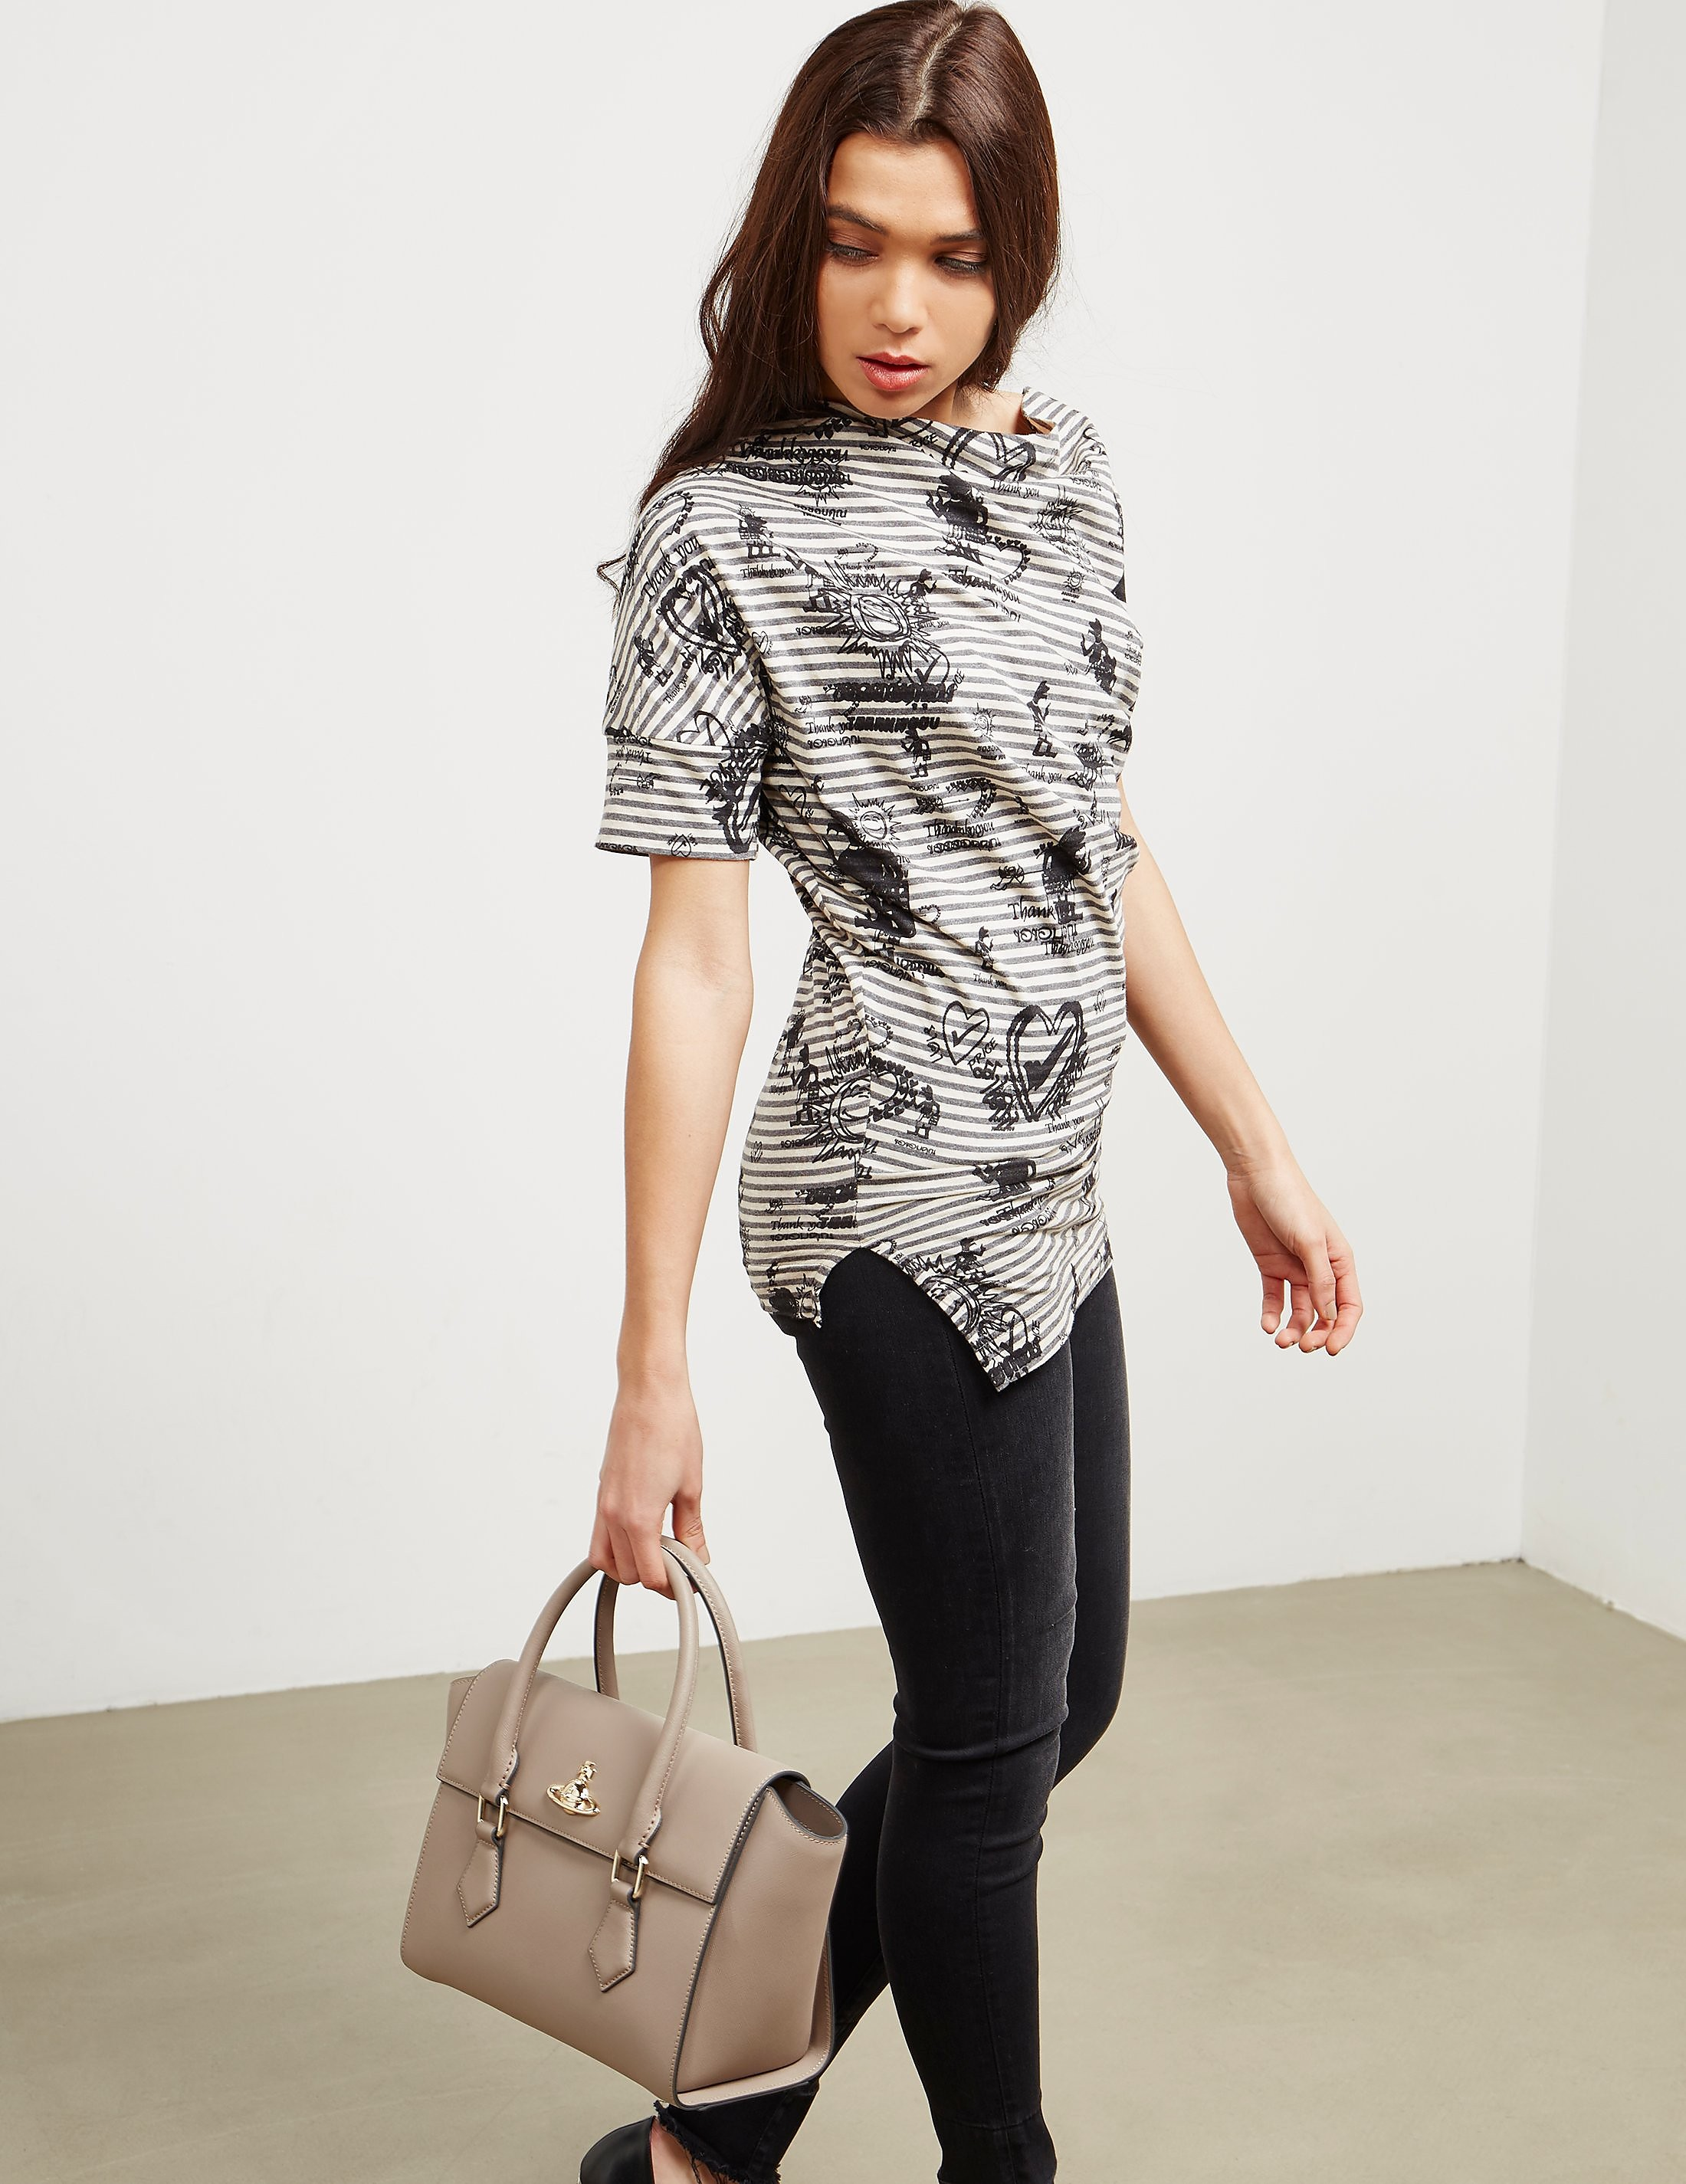 Vivienne Westwood Pimlico Medium Bag